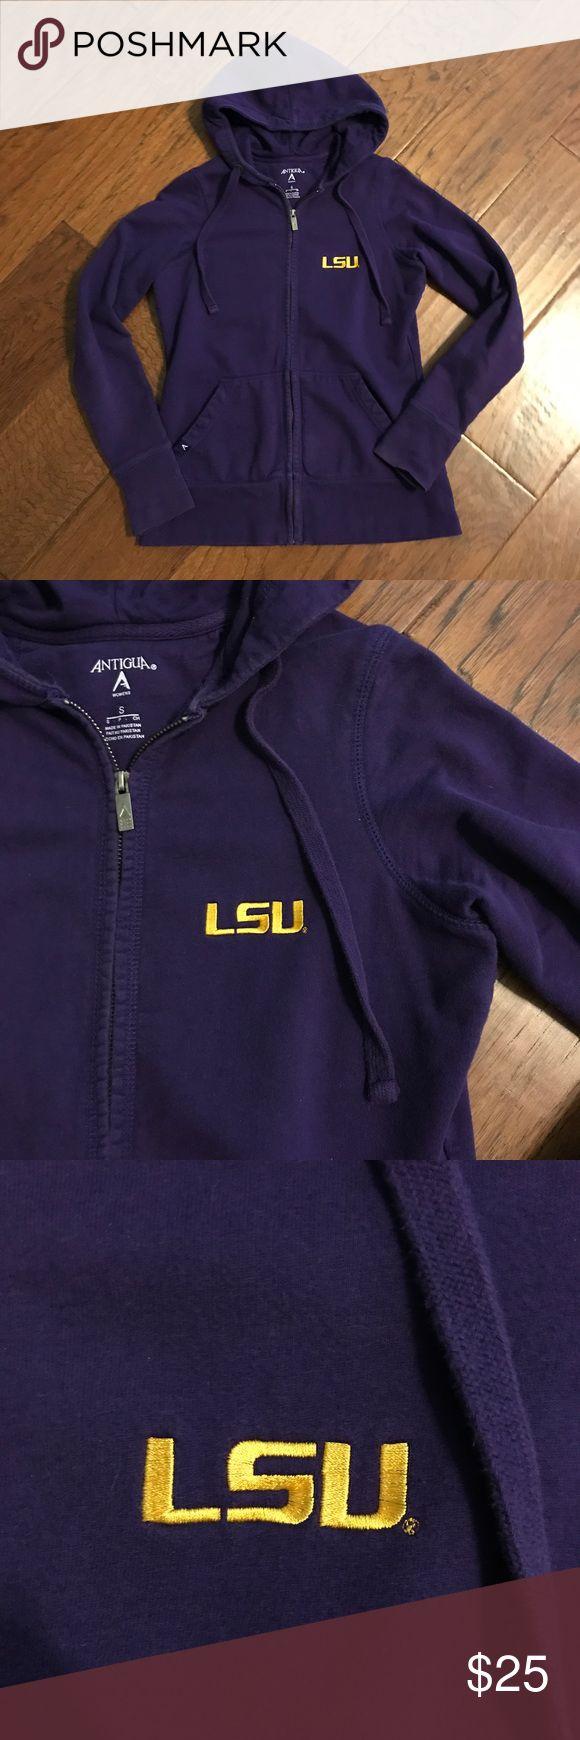 LSU Hoodie Antiqua LSU purple zipper drawstring hoodie with gold logo embroidery on chest. Size adult small. Purchased at LSU stadium store. Lightly worn. Antigua Tops Sweatshirts & Hoodies